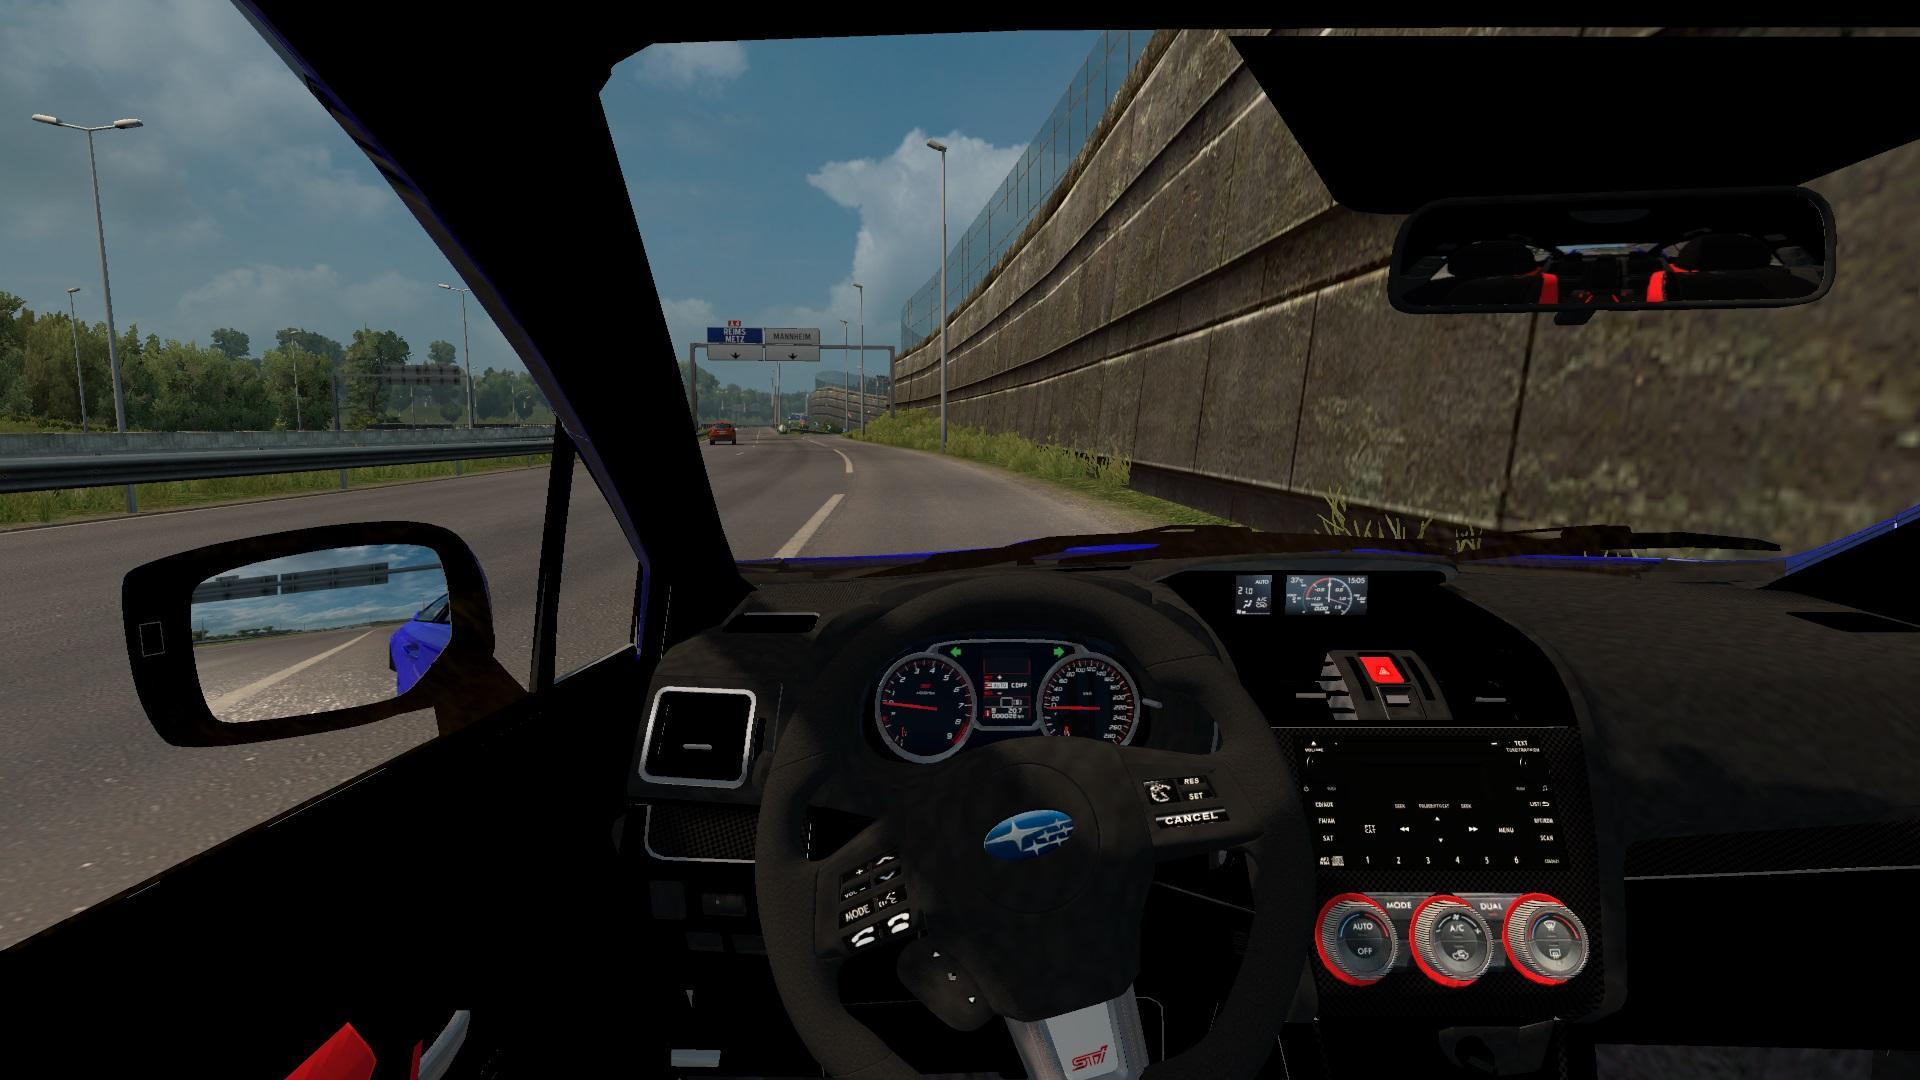 Subaru Impreza Wrx Sti 2017 V1 0 Car Mod Euro Truck Simulator 2 Mods